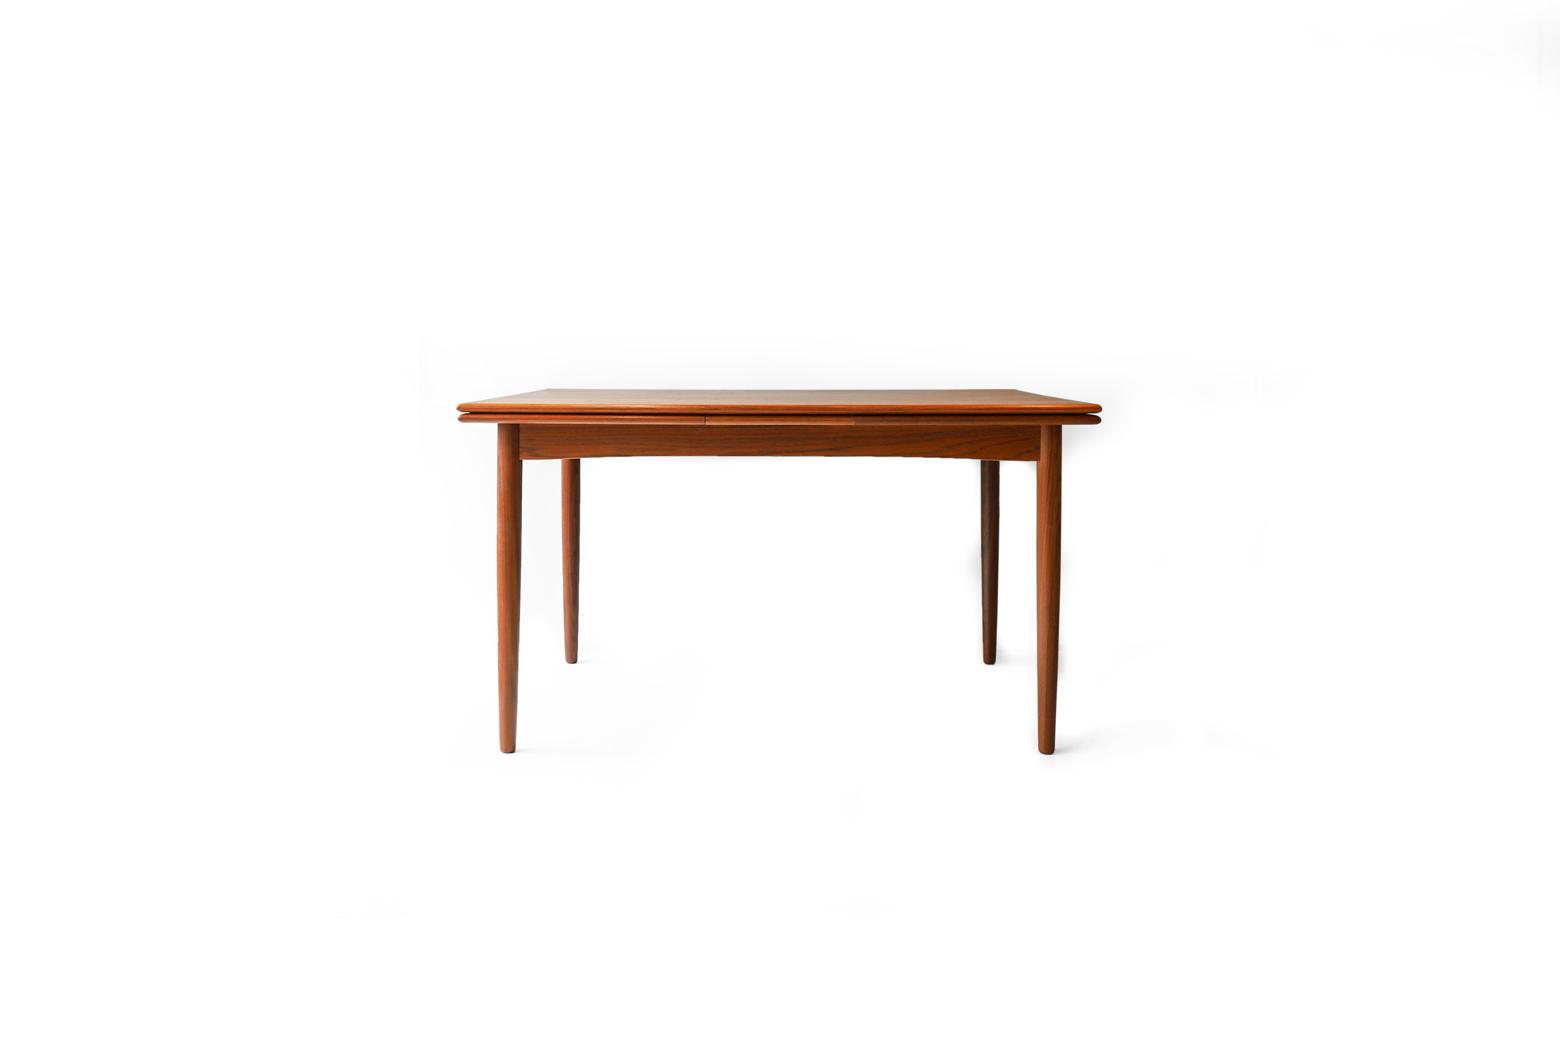 Danish Vintage N&R Møbler Extension Dining Table/デンマーク ヴィンテージ エクステンション ダイニングテーブル